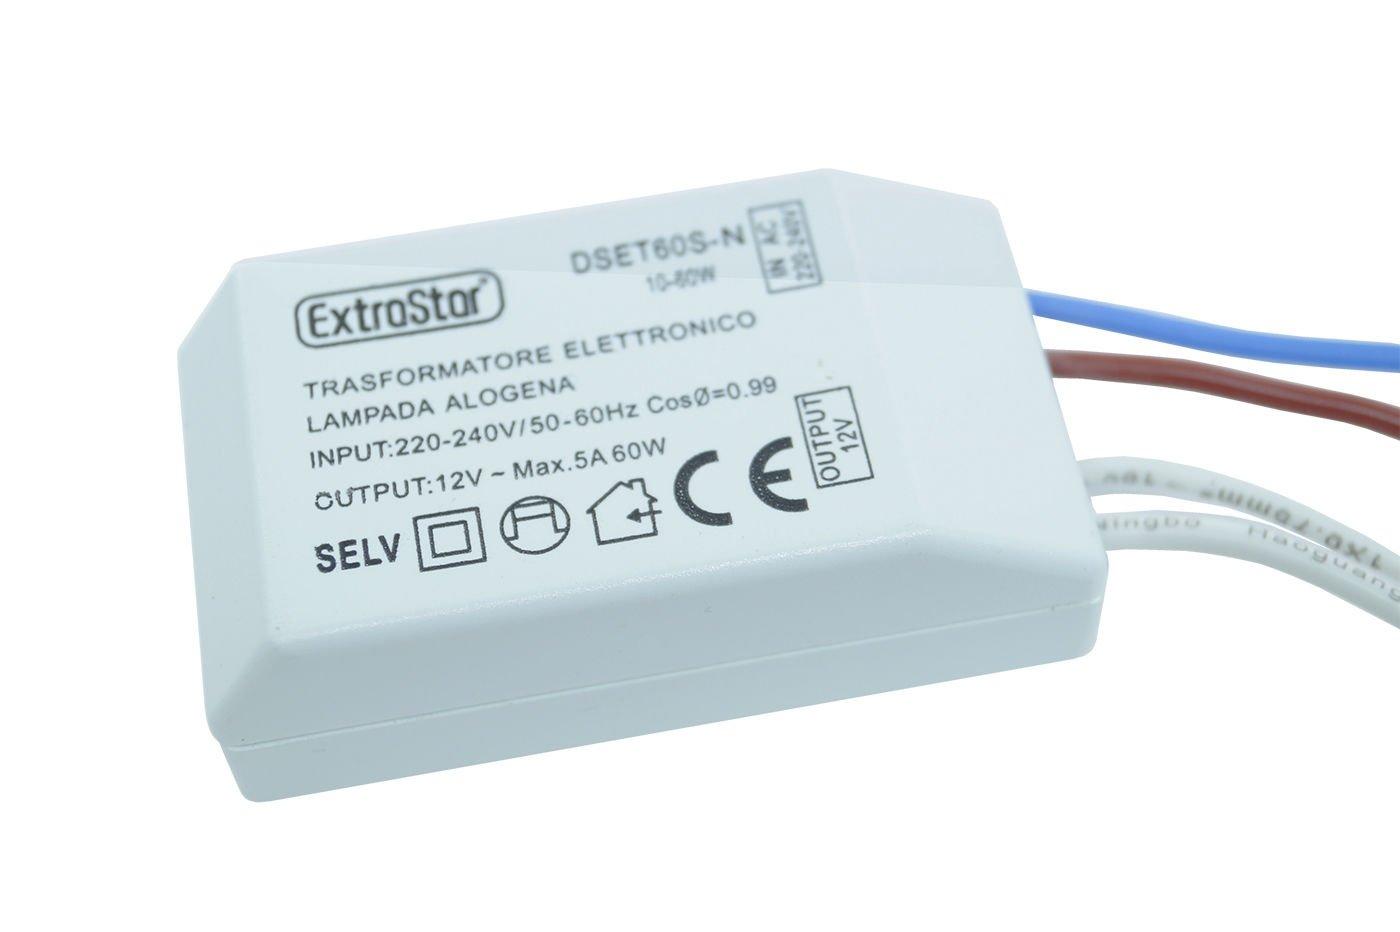 /240/V takestop/® Trafo elektronisch et60sn f/ür Halogenlampe 10/ /60/W 5/A Output 12/V mit Draht in AC 220/